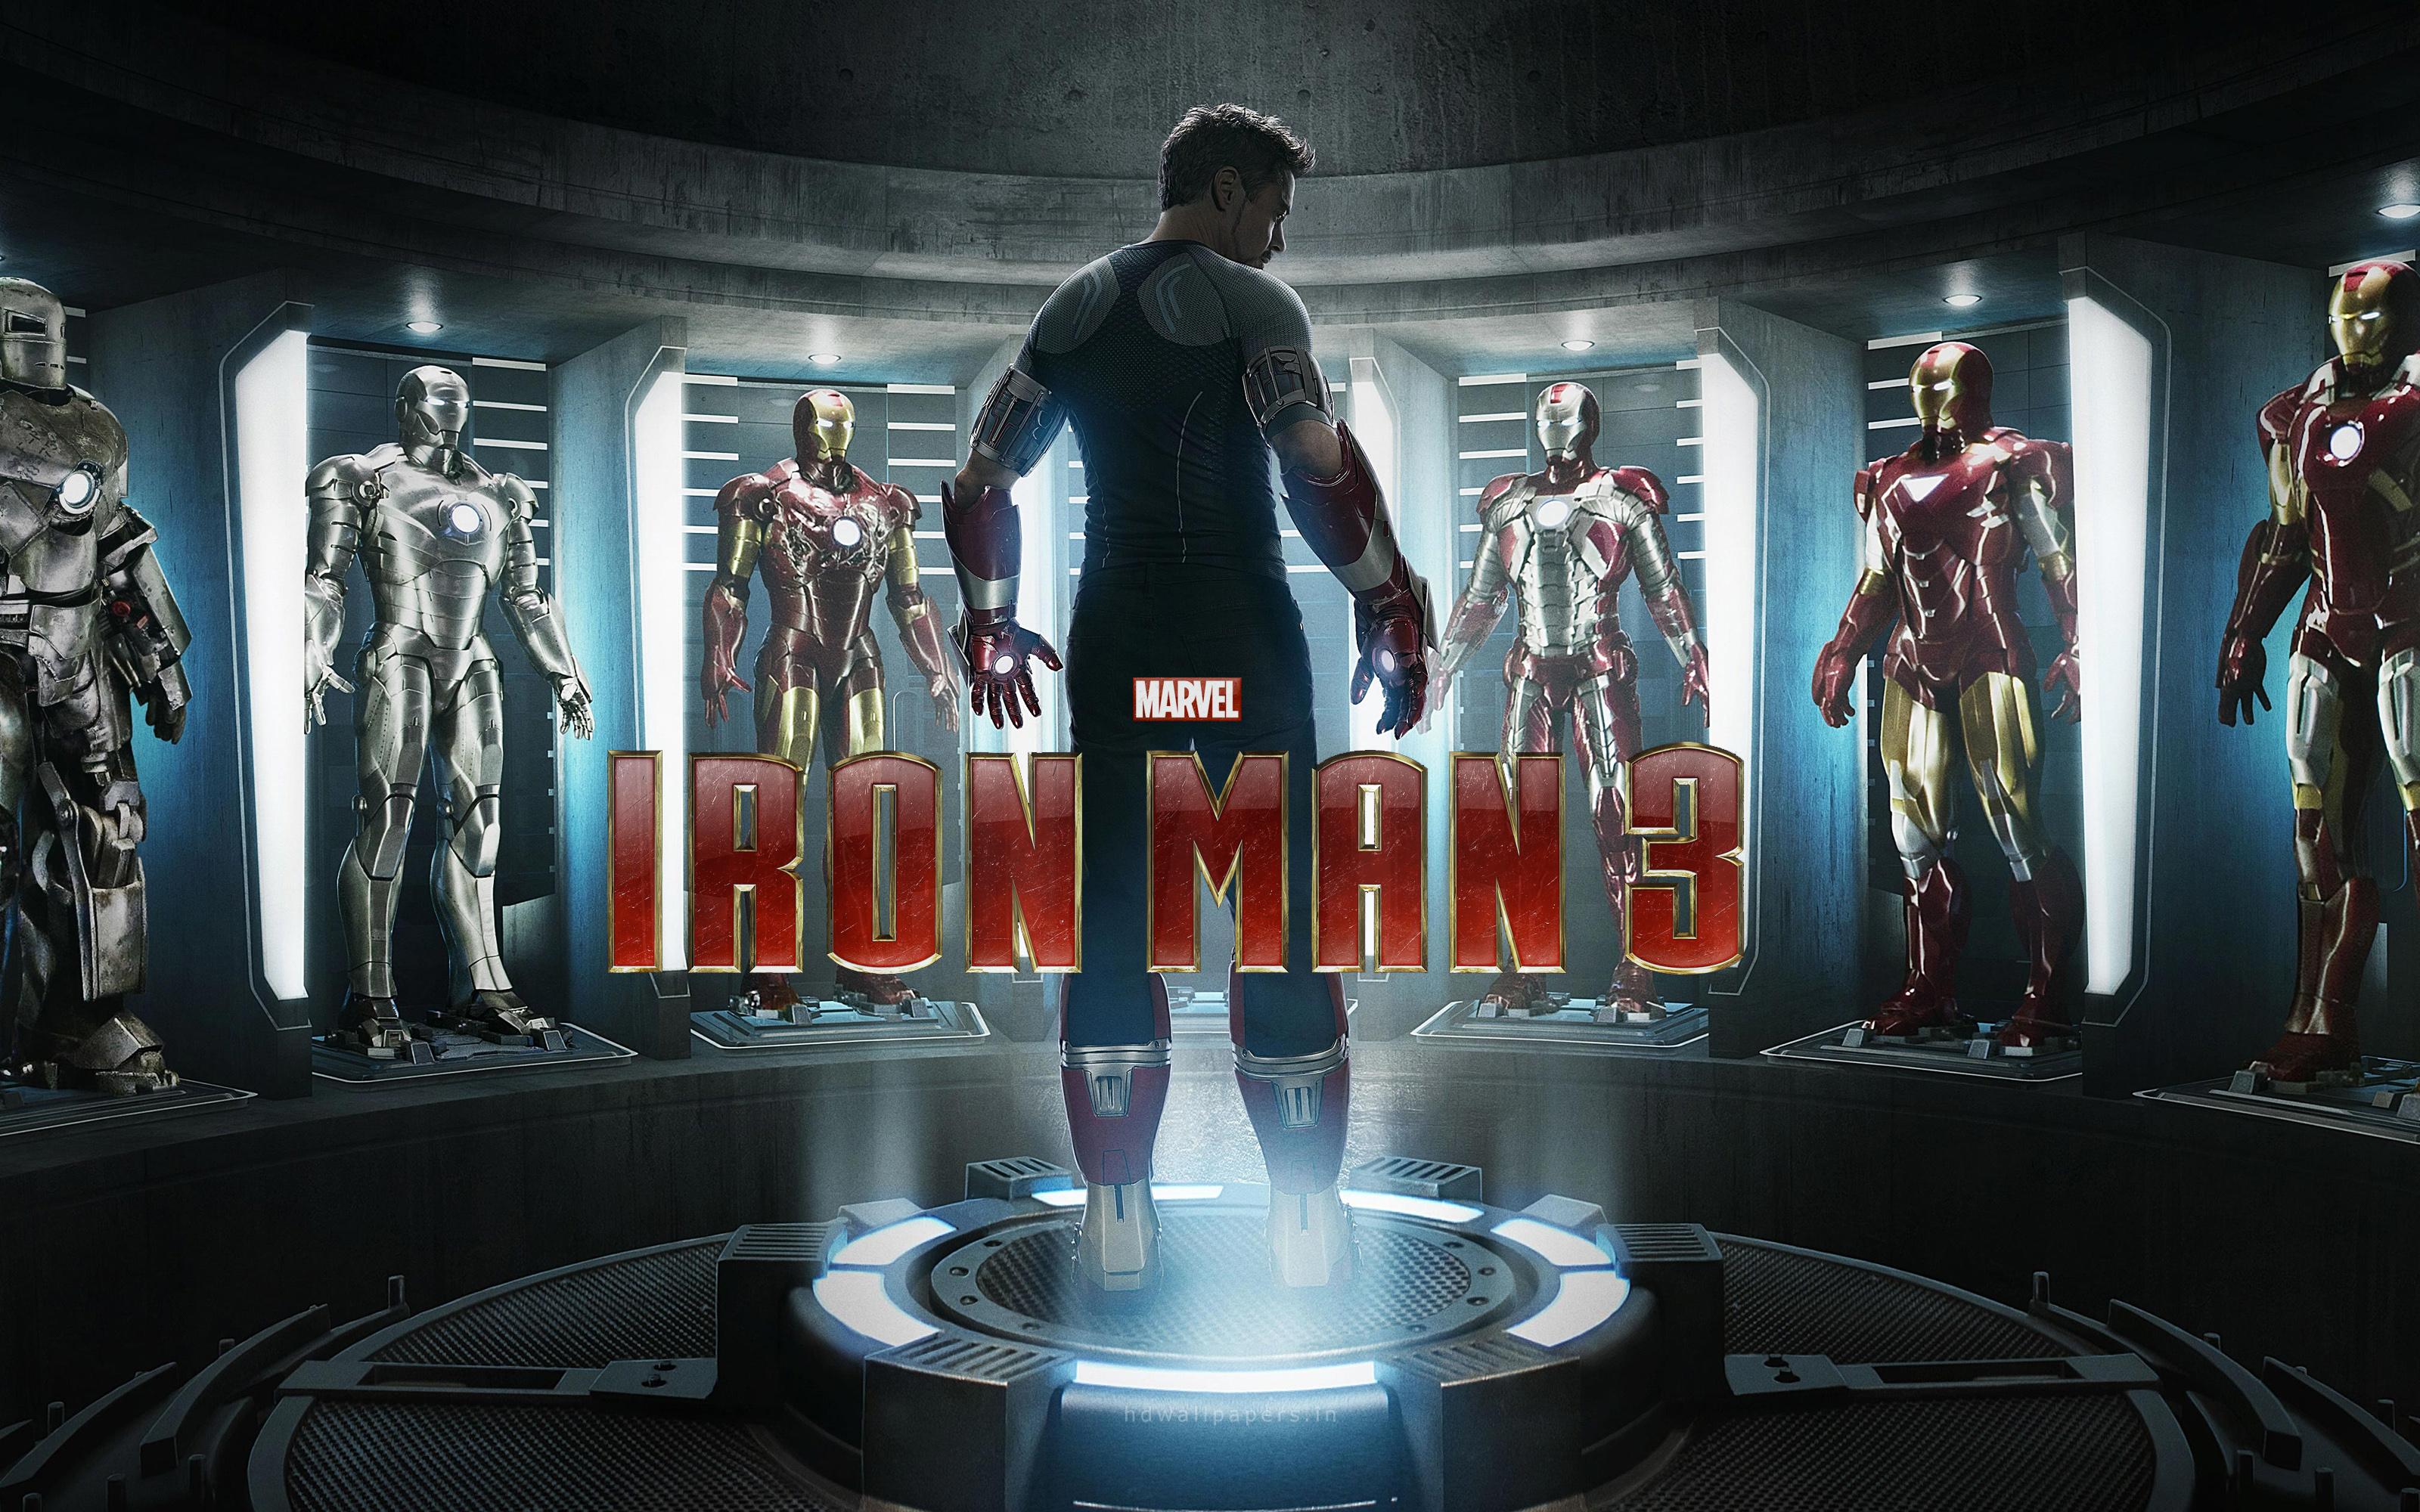 Iron Man 3 Opens to Record Breaking International Box Office